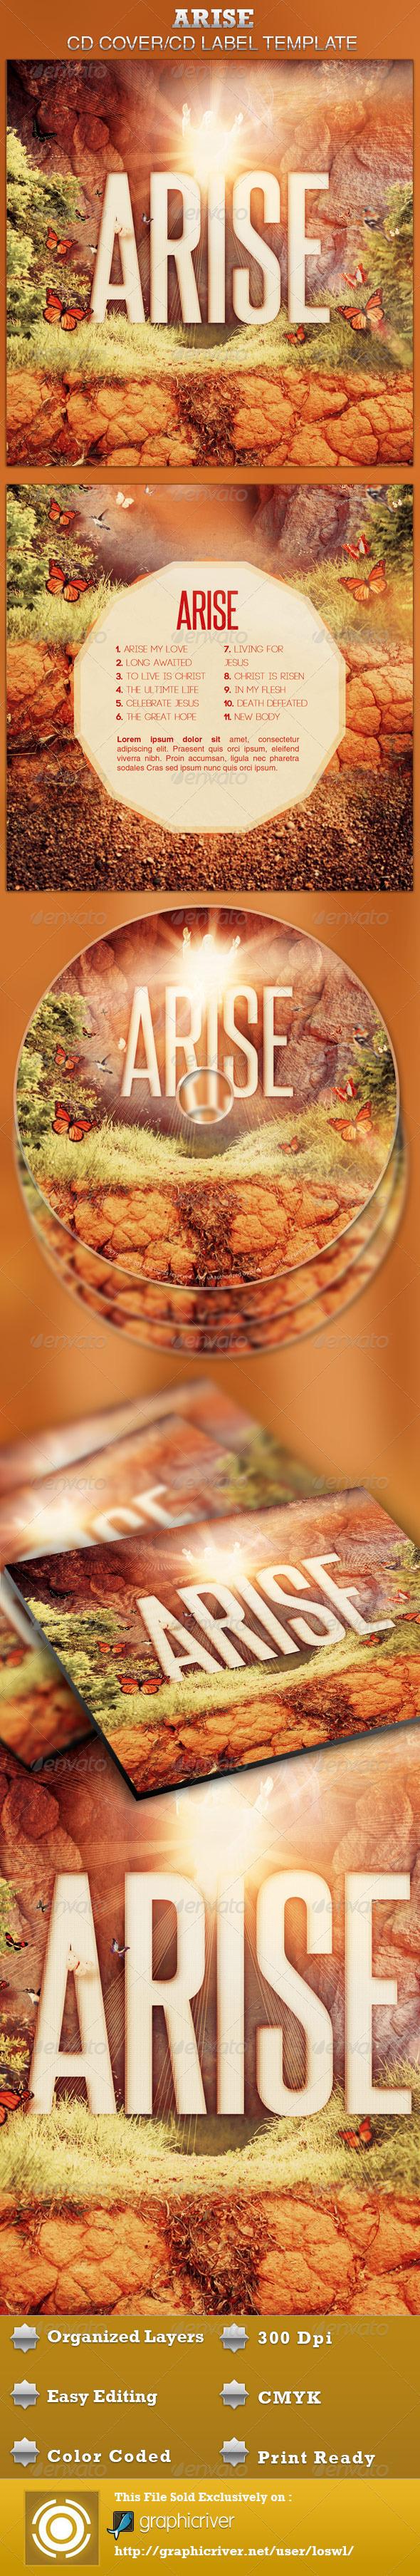 Arise CD Artwork Template - CD & DVD Artwork Print Templates